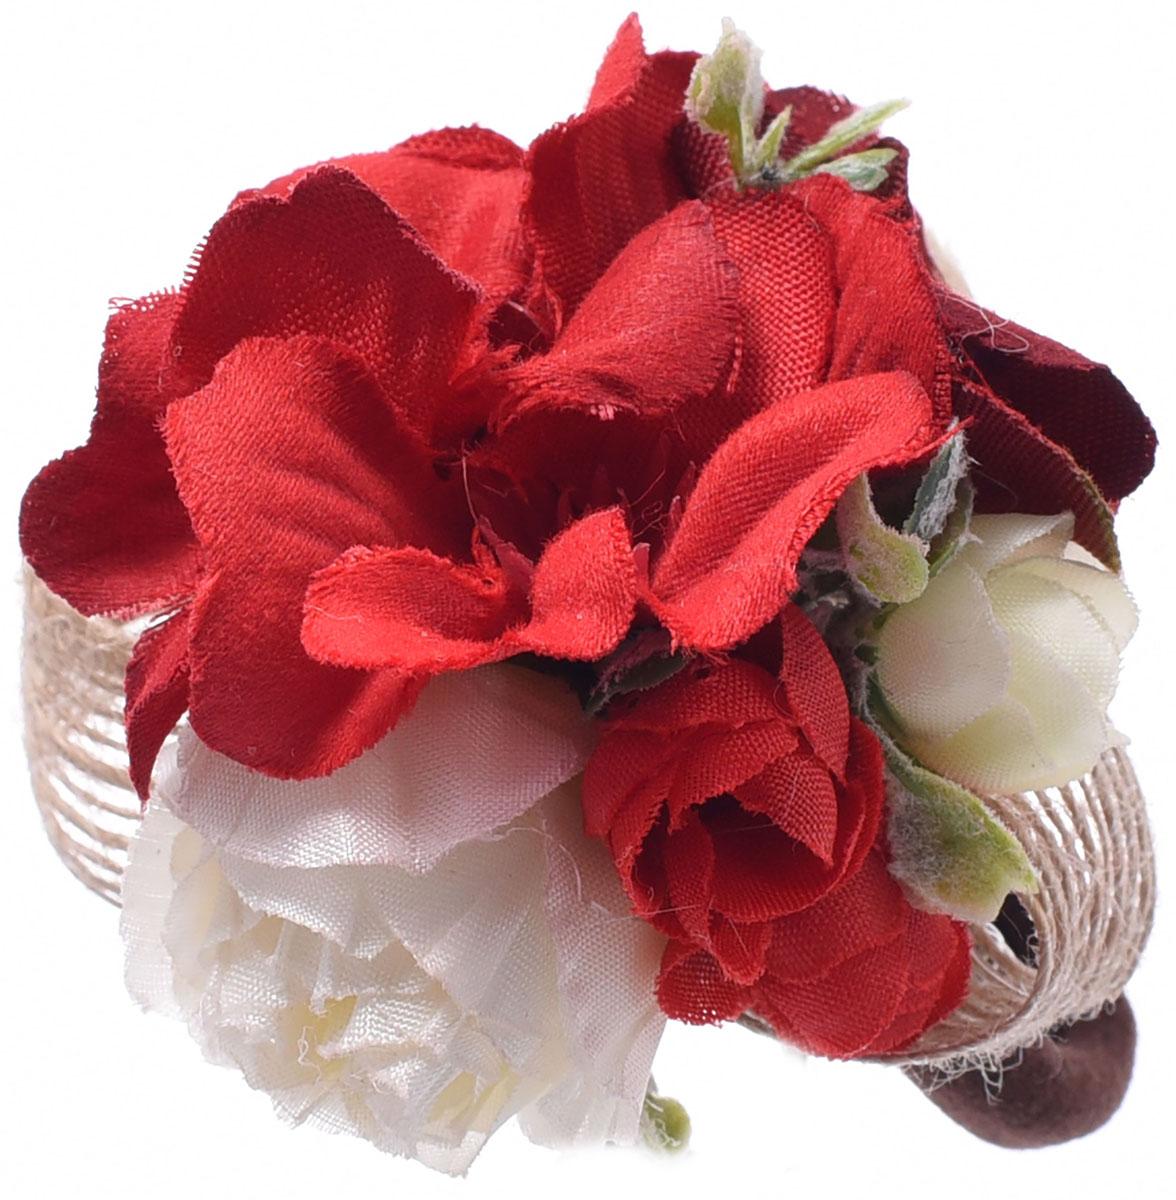 Резинка для волос Malina By Андерсен Флорентина, цвет: красный. 11808рб5311808рб53